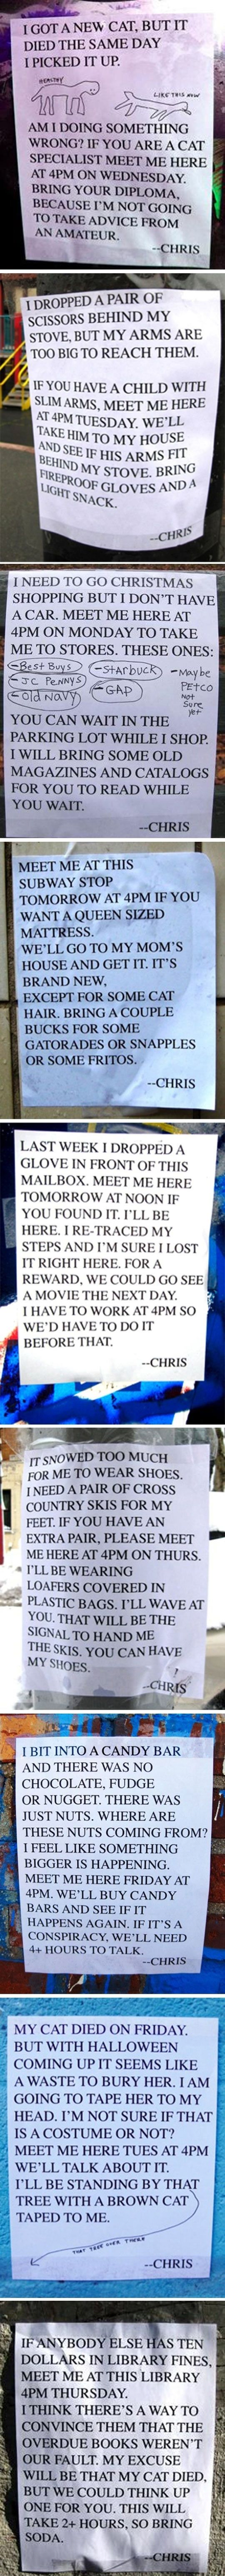 Chris seems like an interesting fellow.